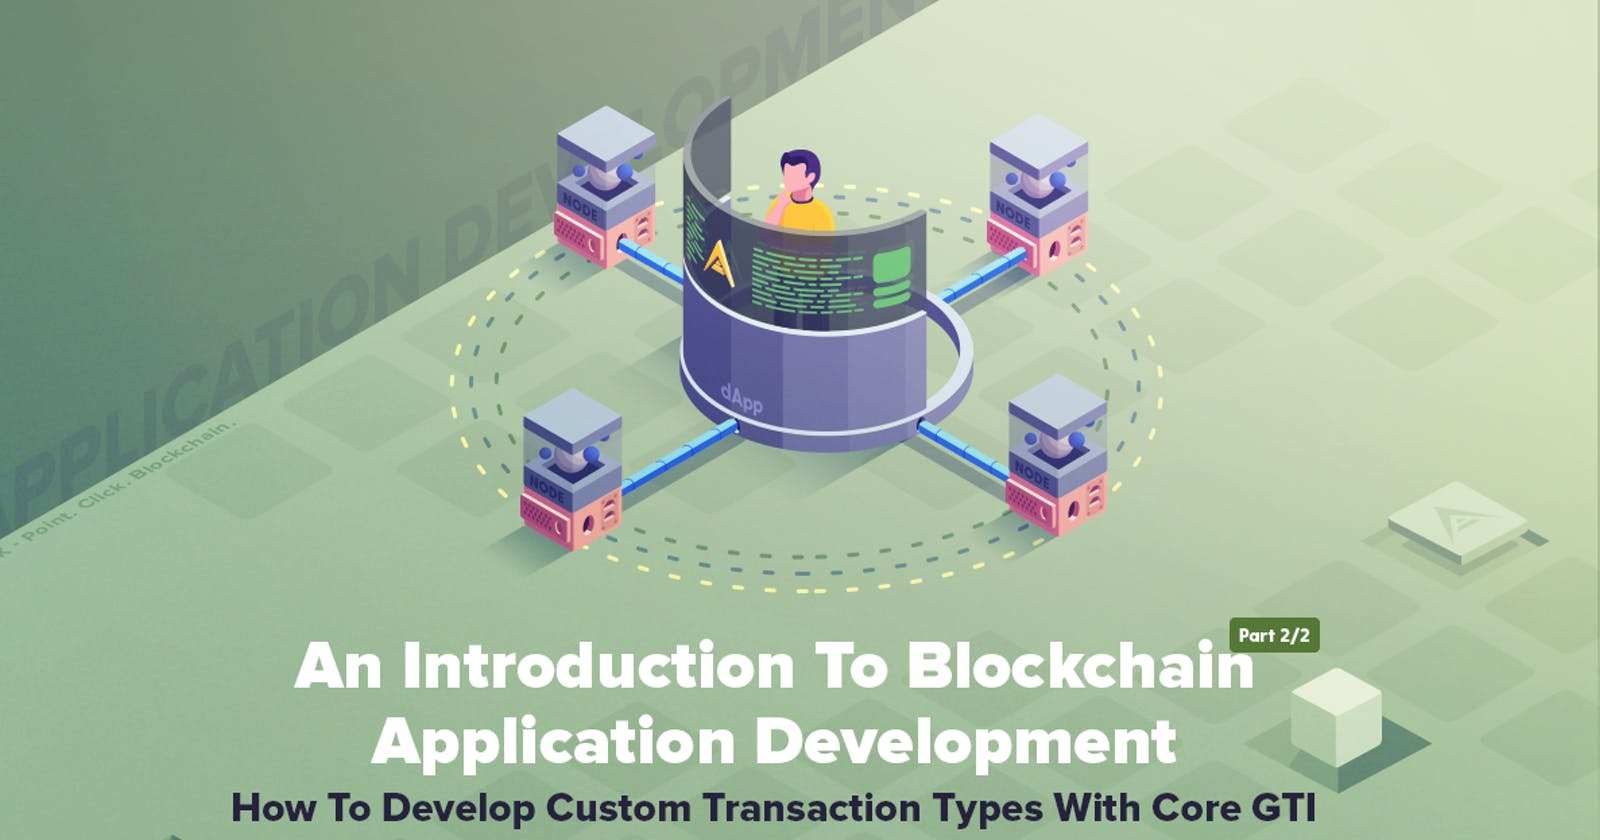 The Introduction To Blockchain Application Development — Part 2/2